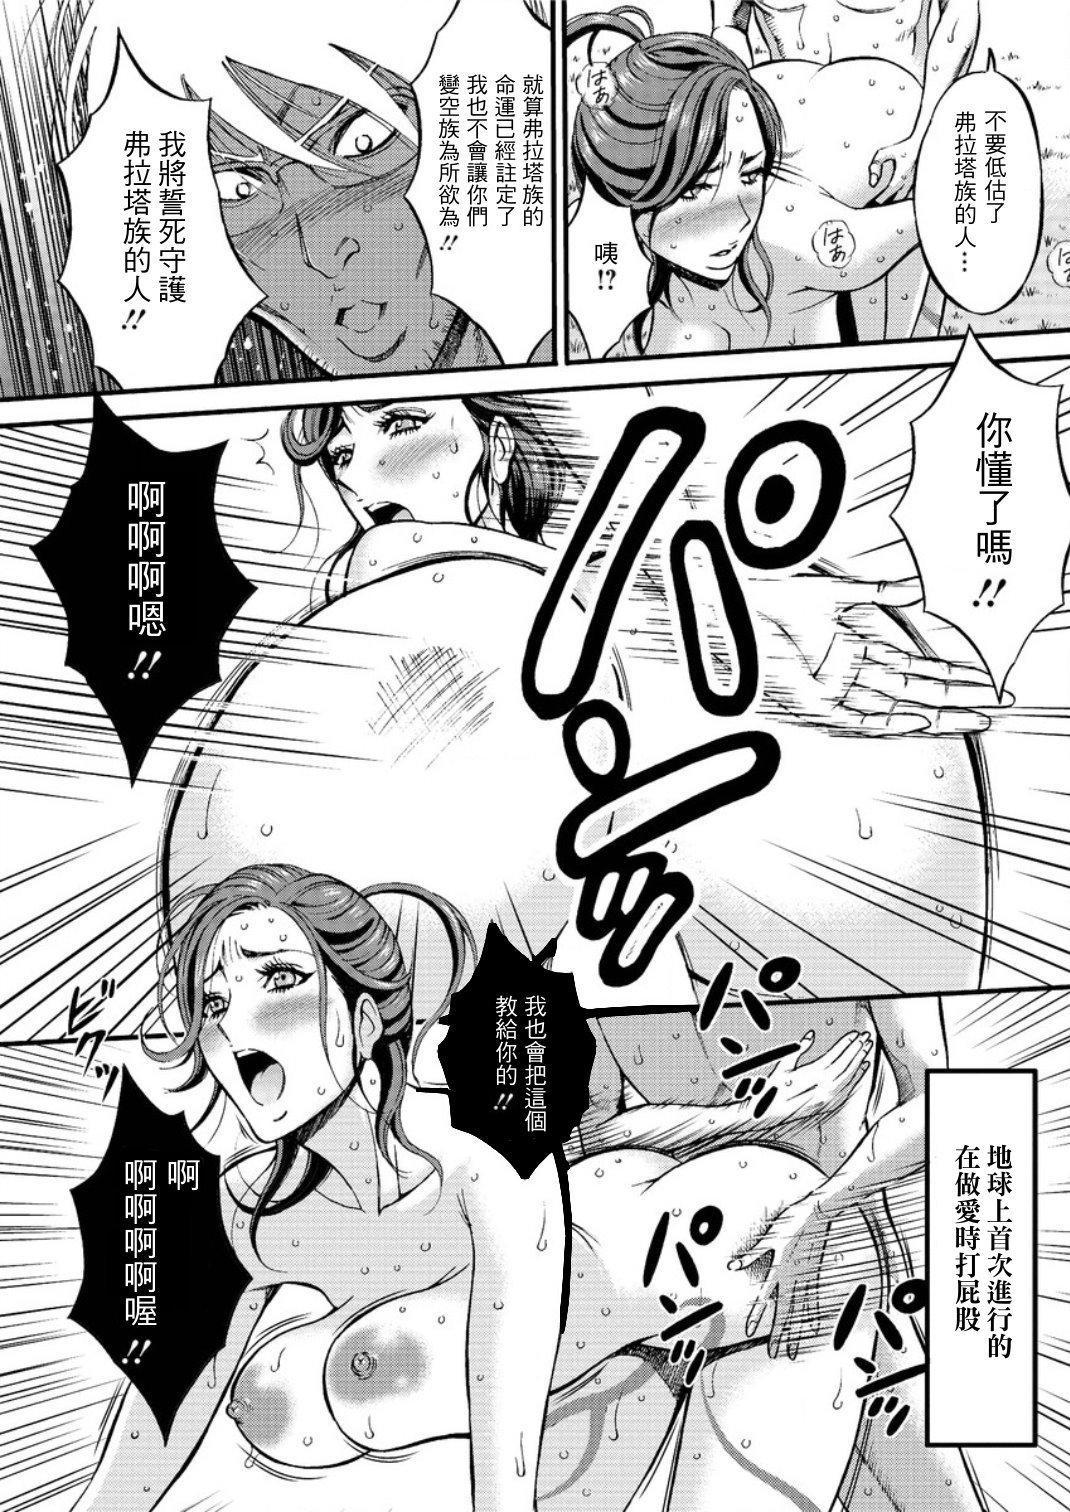 Kigenzen 10000 Nen no Ota | 史前一萬年的宅男 Ch. 19-24 69